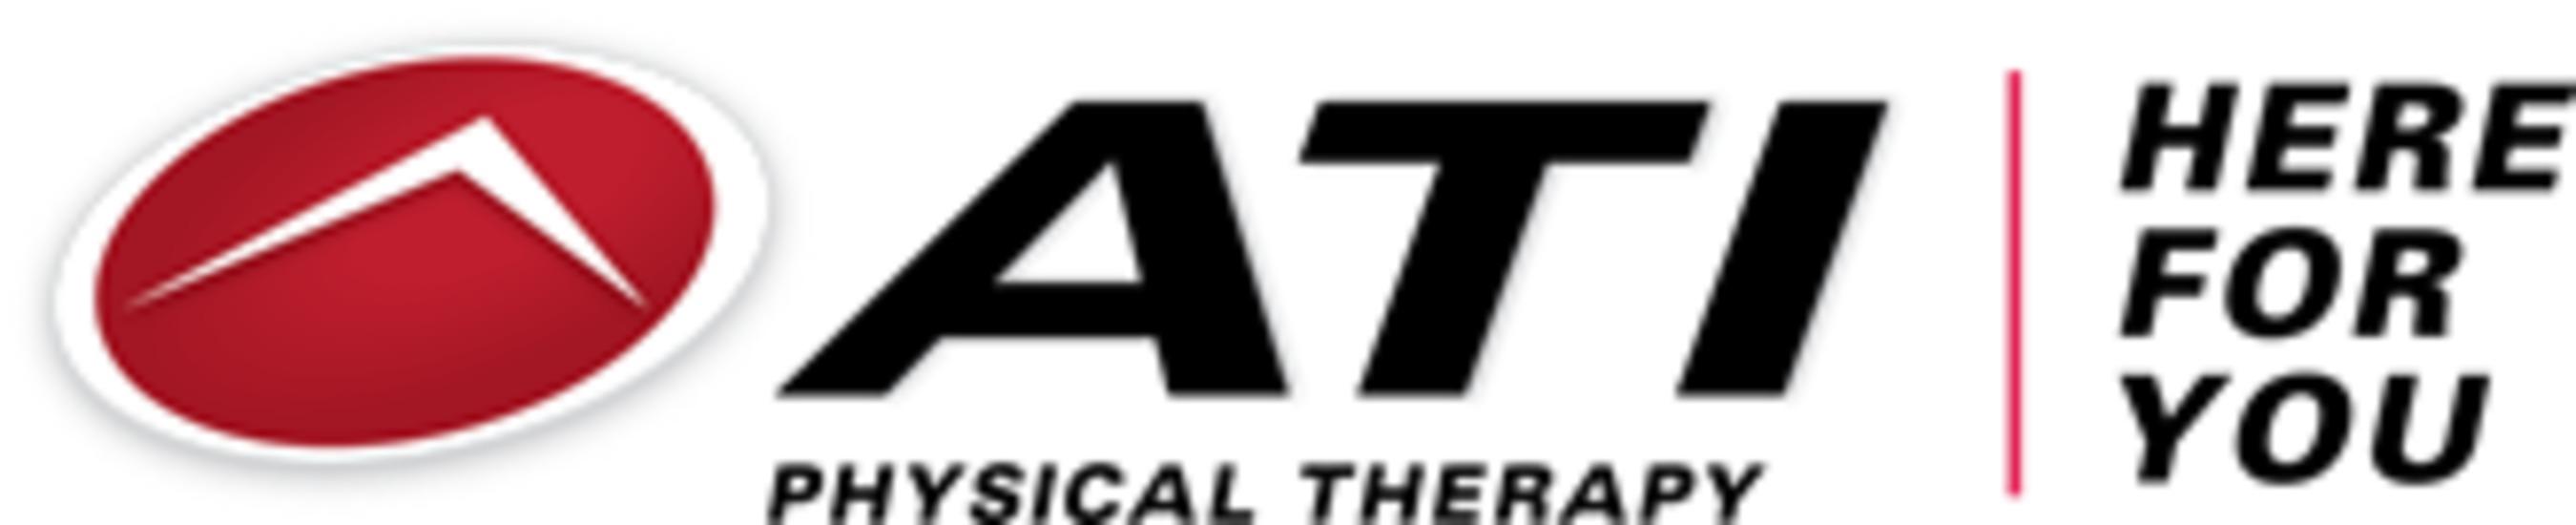 ATI Physical Therapy (PRNewsFoto/ATI Physical Therapy)